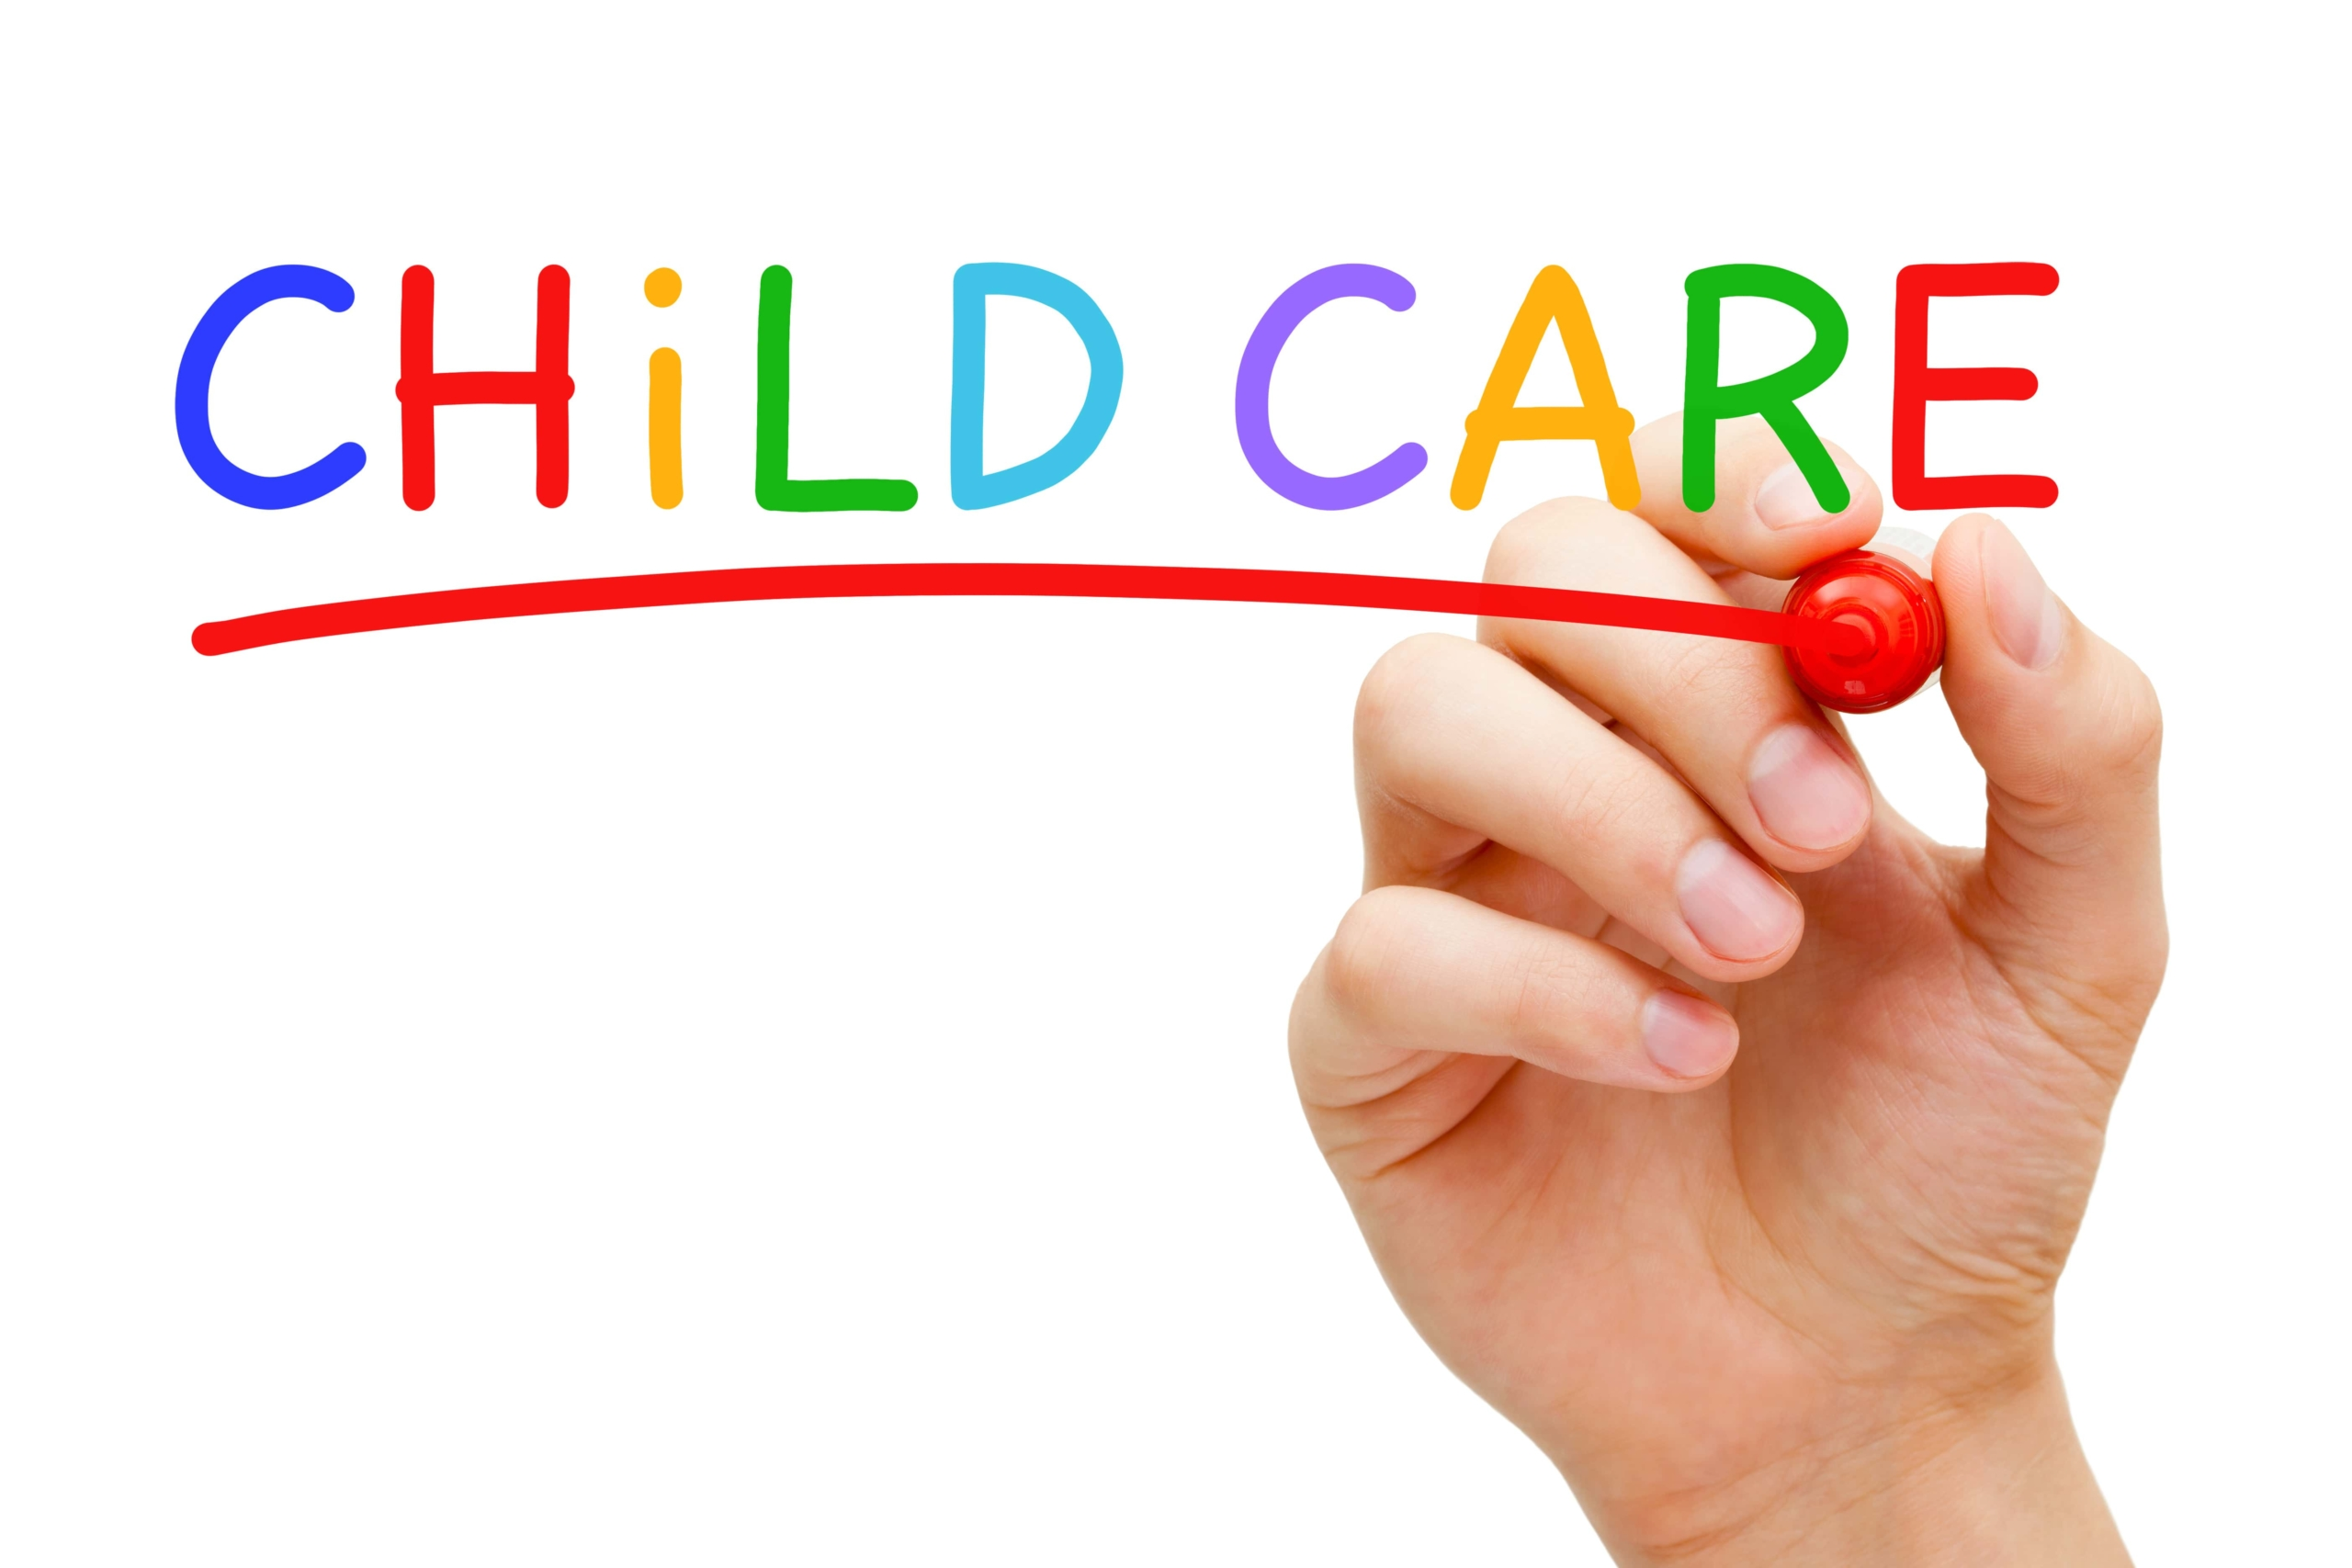 Childcare SEO